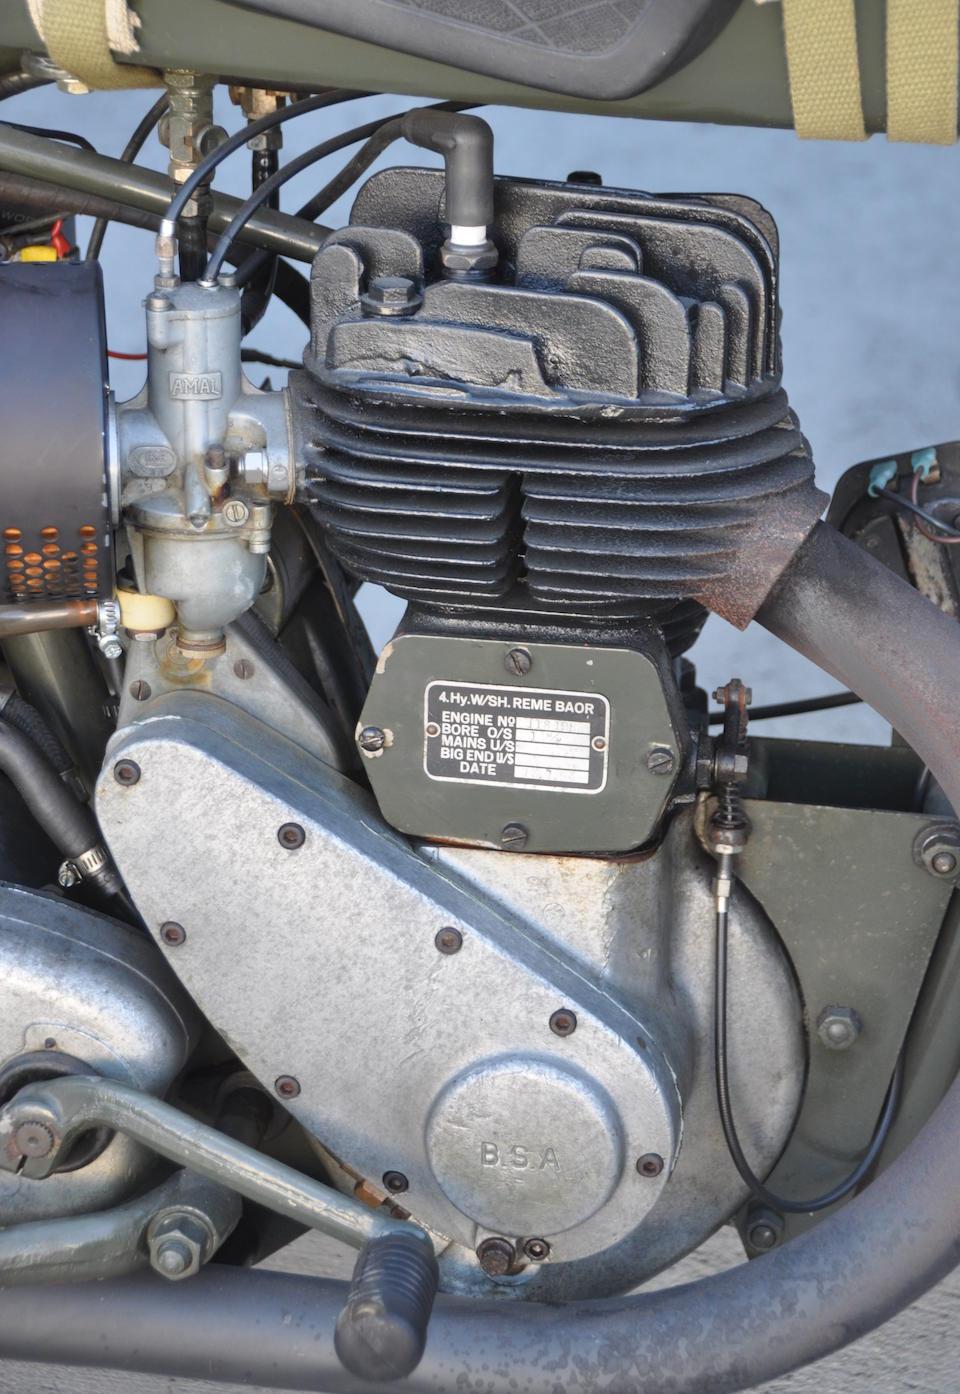 Bonhams : 1943 BSA M20 Military Motorcycle Engine no  118198